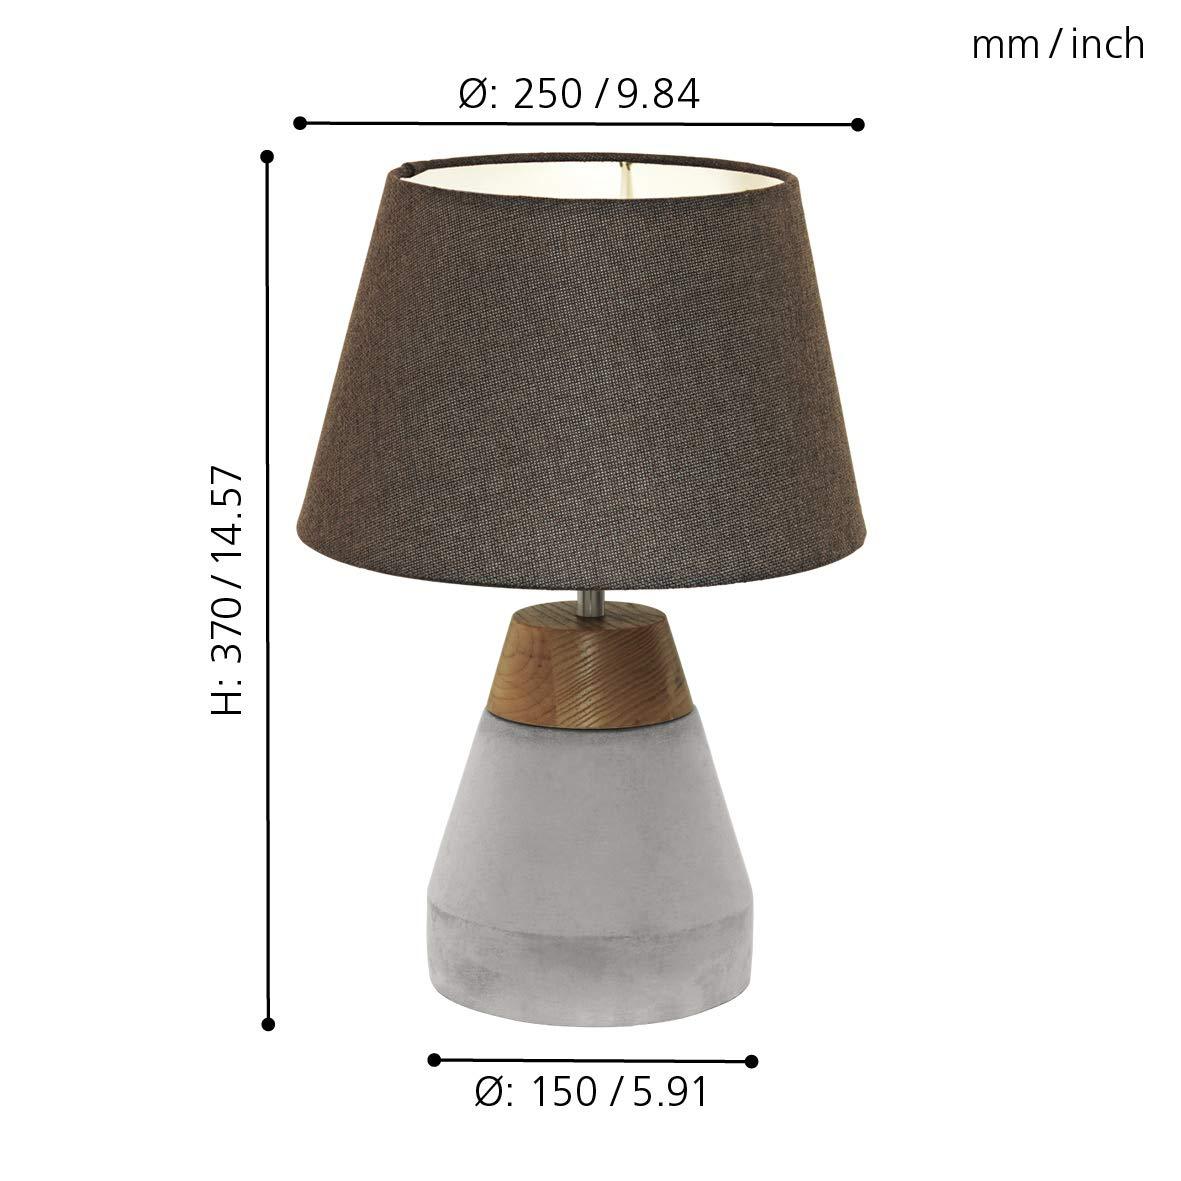 Beton Material: Stahl Holz braun Fassung: E27 EGLO Pendellampe Tarega /Ø: 150 mm 1 flammige Beton H/ängeleuchte Farbe: Grau